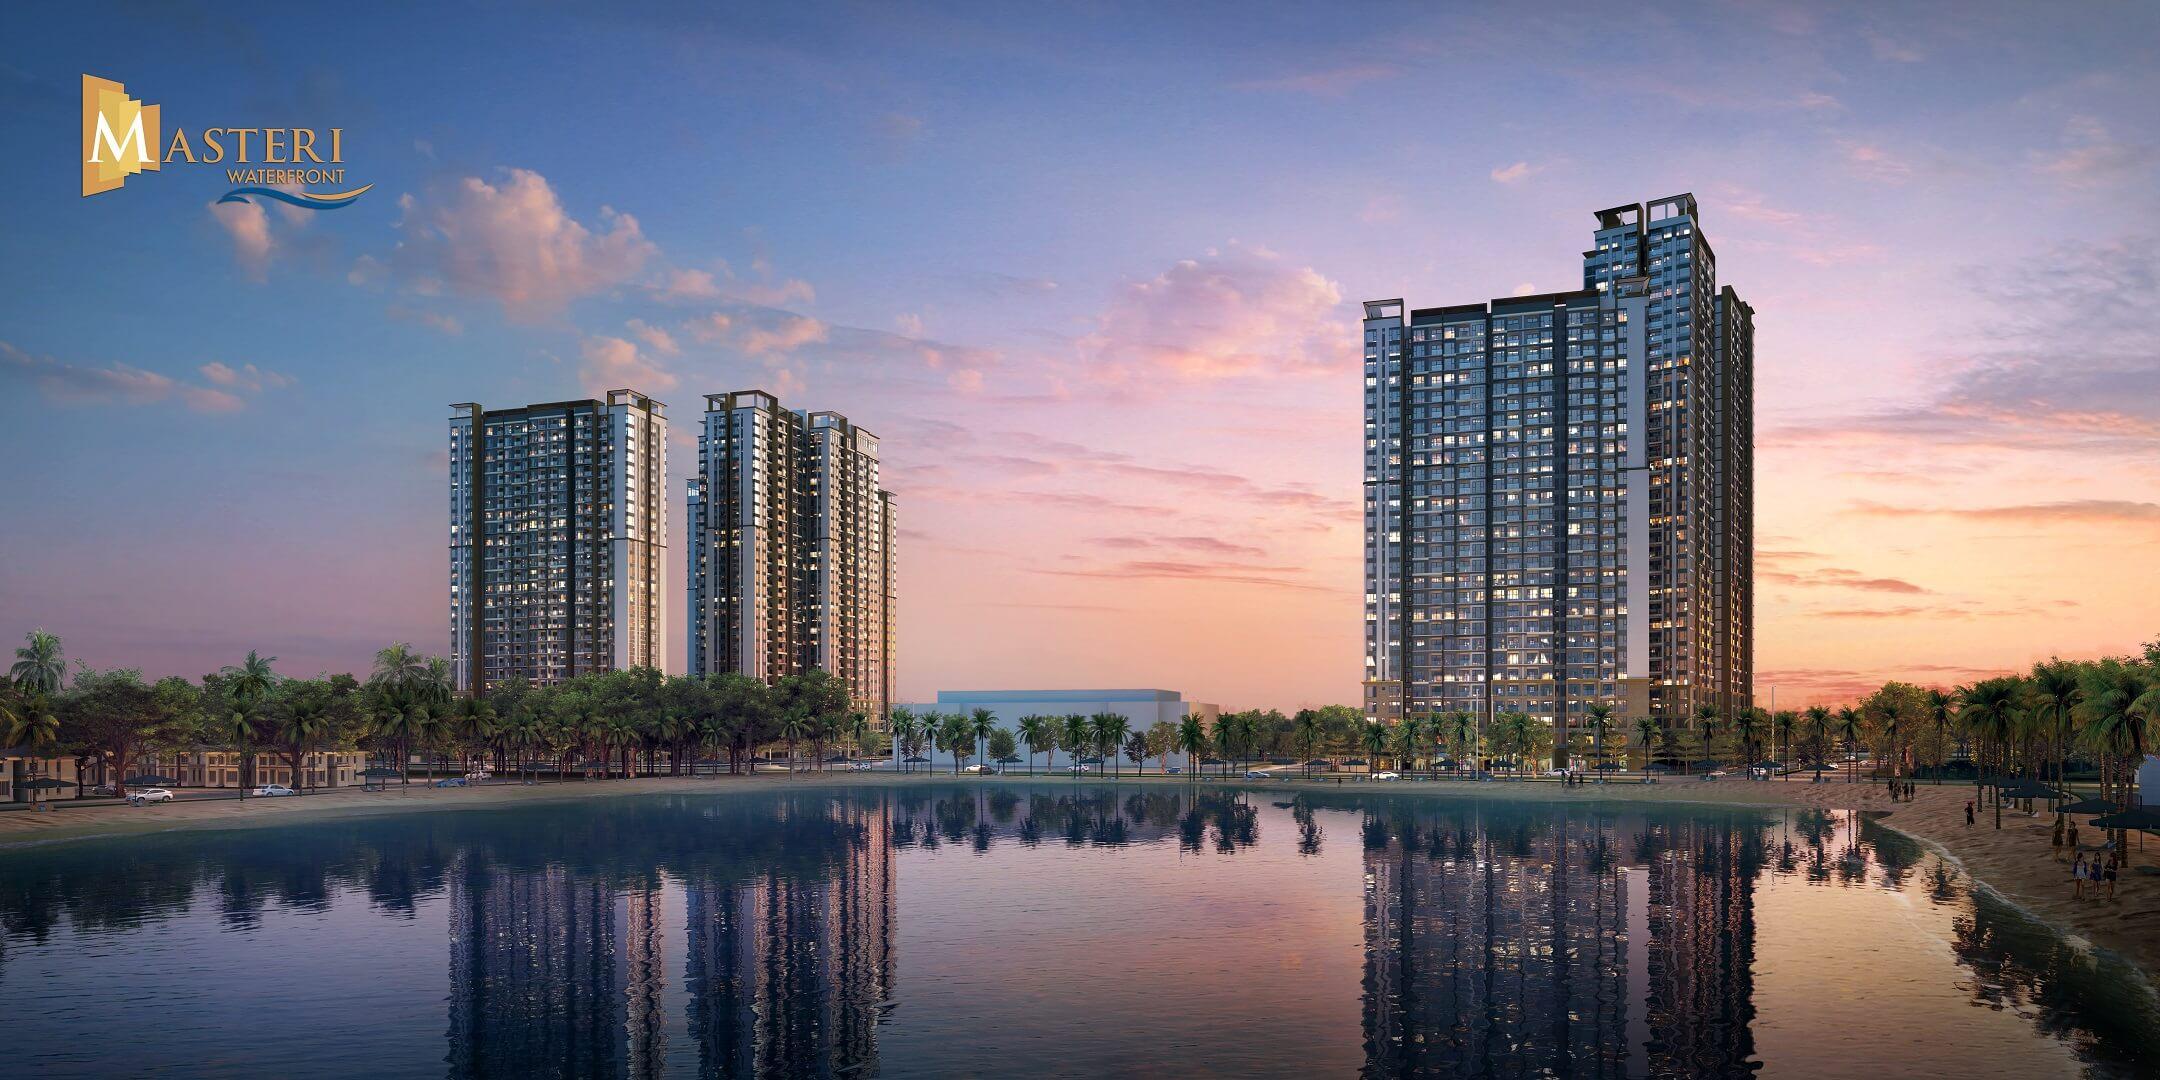 dự án chung cư masteri waterfront ocean park